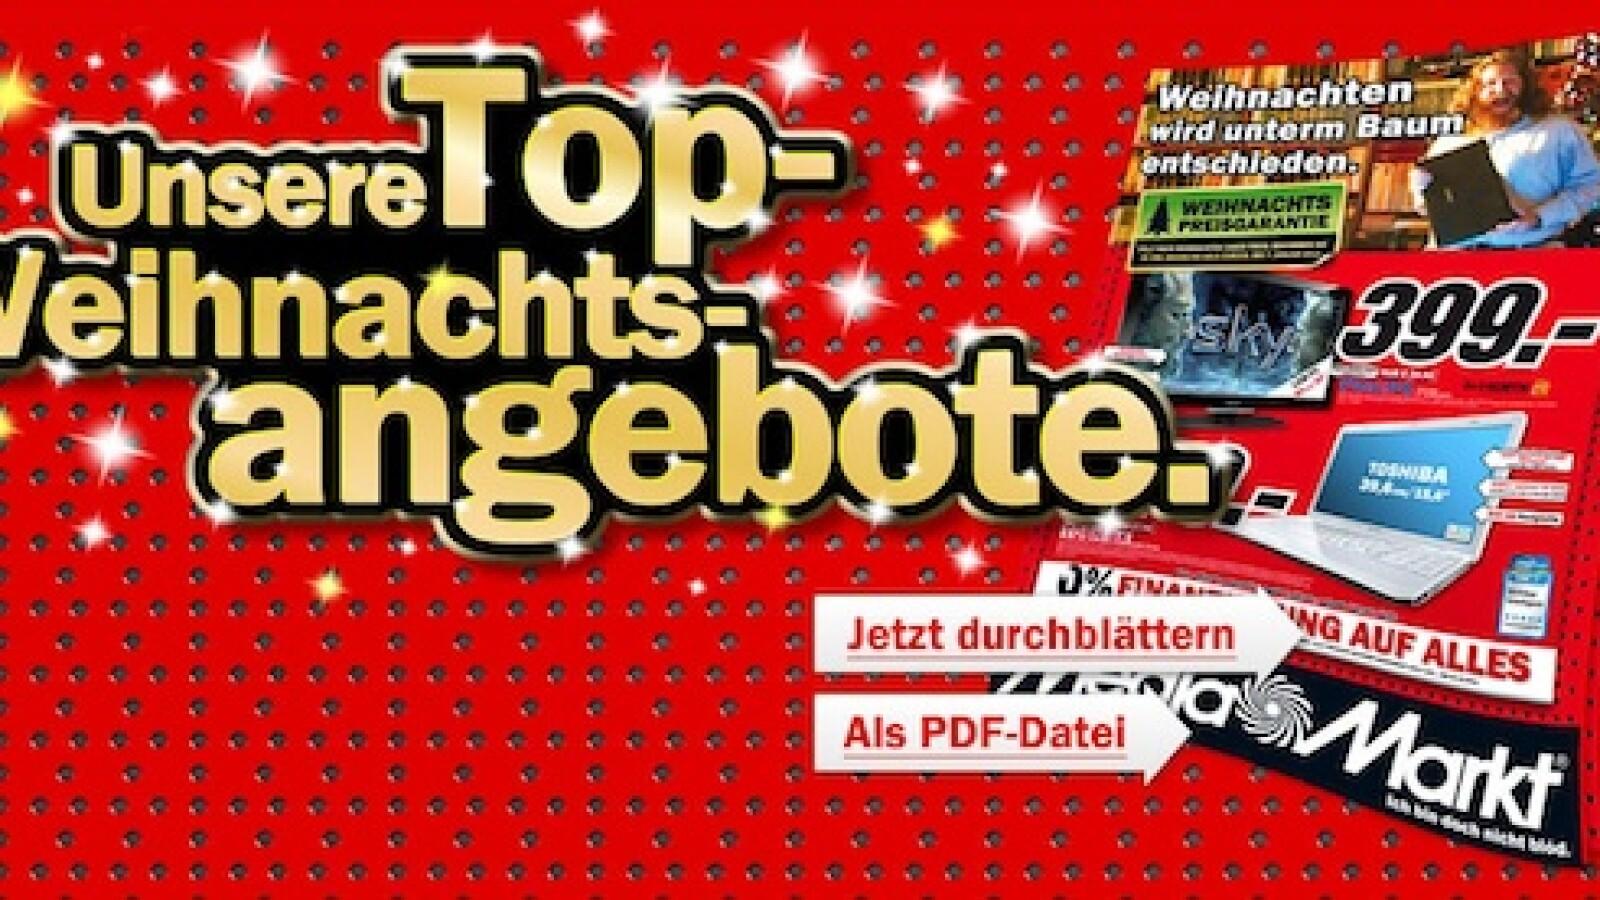 preise singlebörsen Dortmund